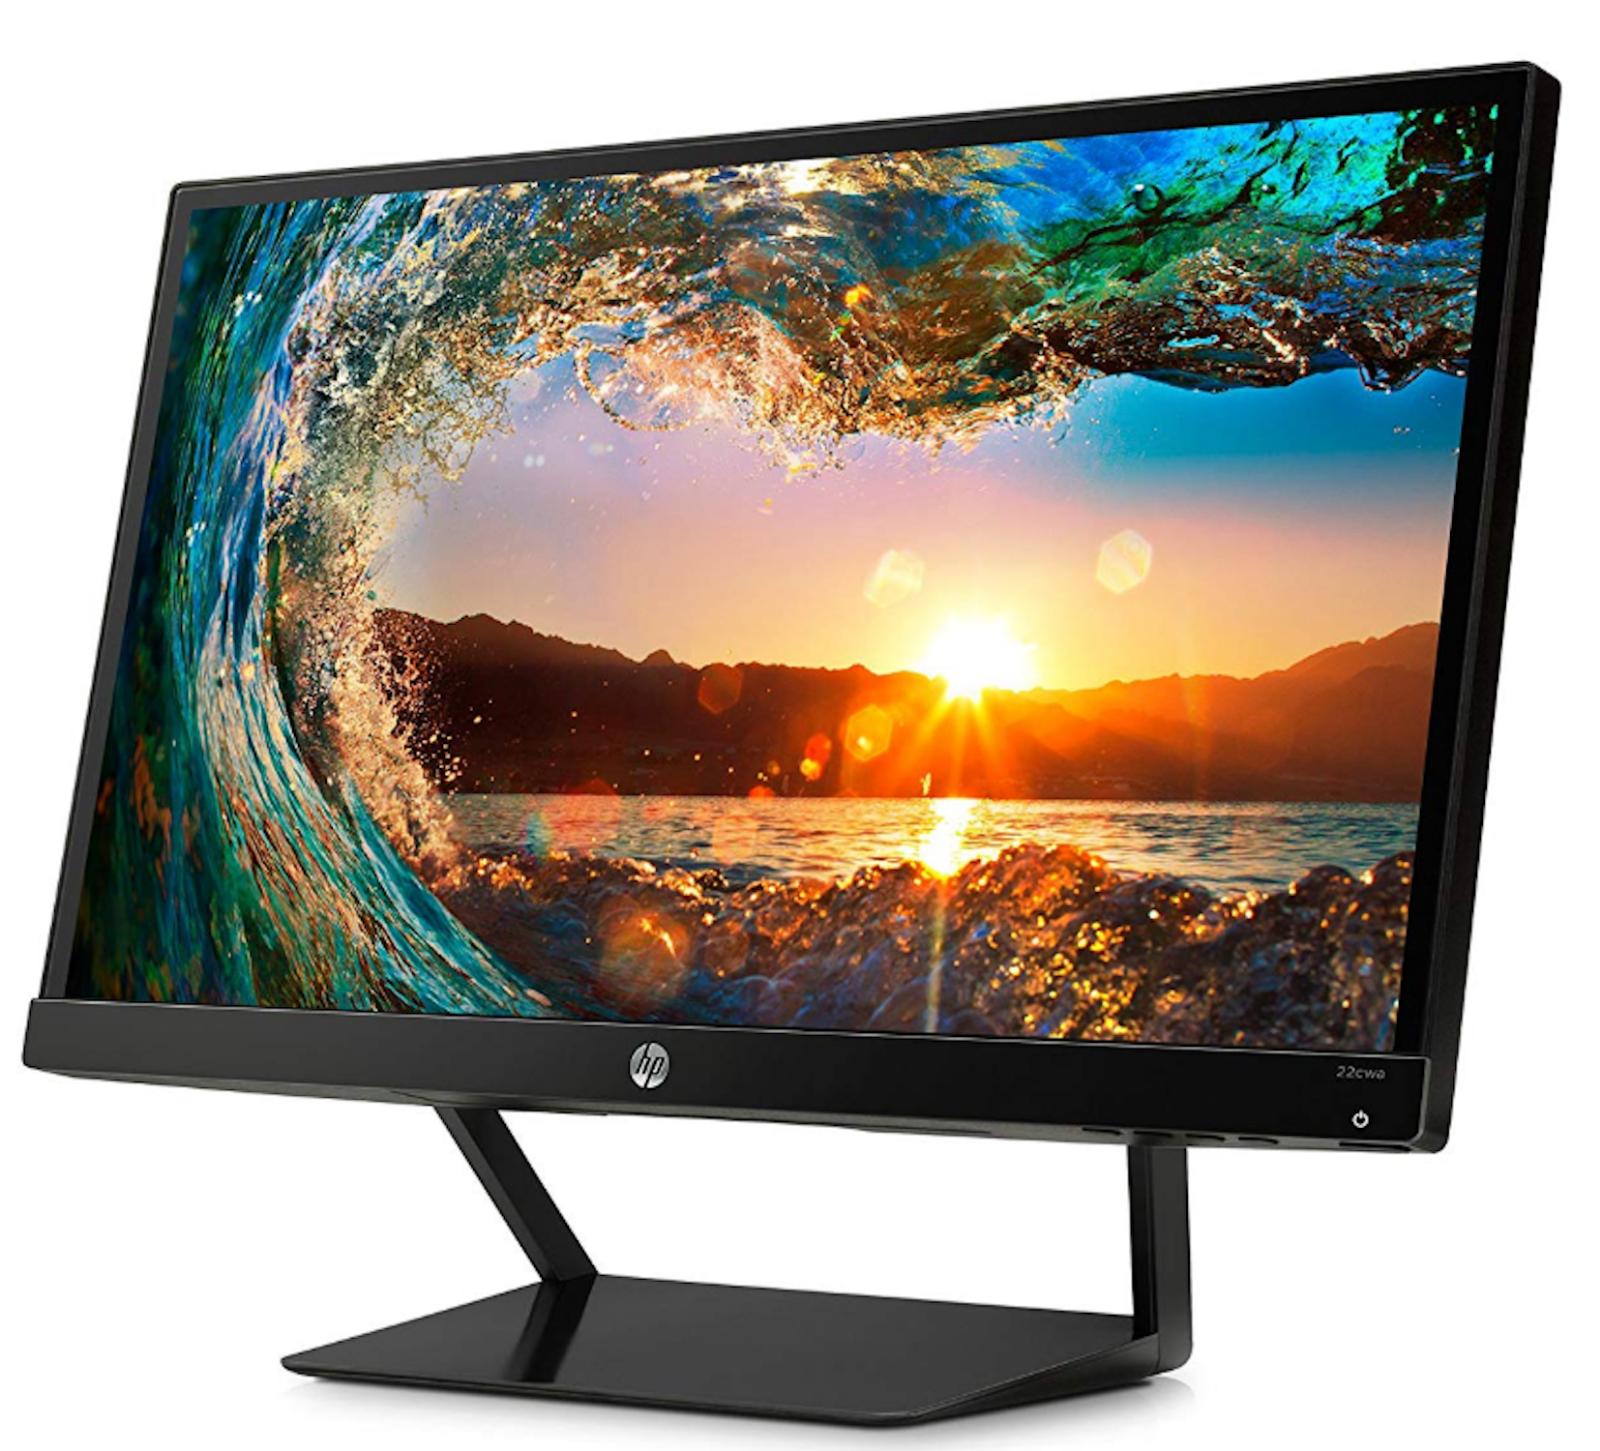 "HP Pavilion 21.5"" Full HD IPS LED HDMI VGA Monitor 1920 x 1080 7 ms 22CWA"